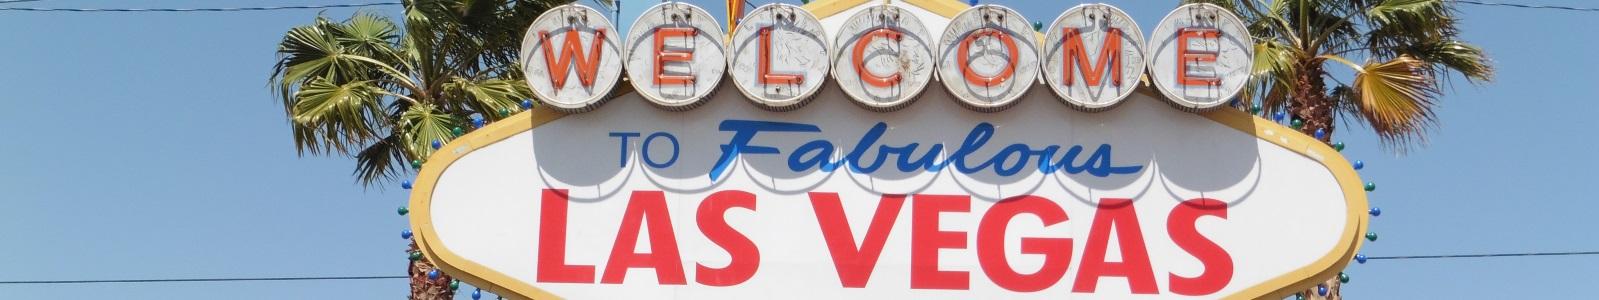 Mardi 14 avril 2015 : Las Vegas, Route 66